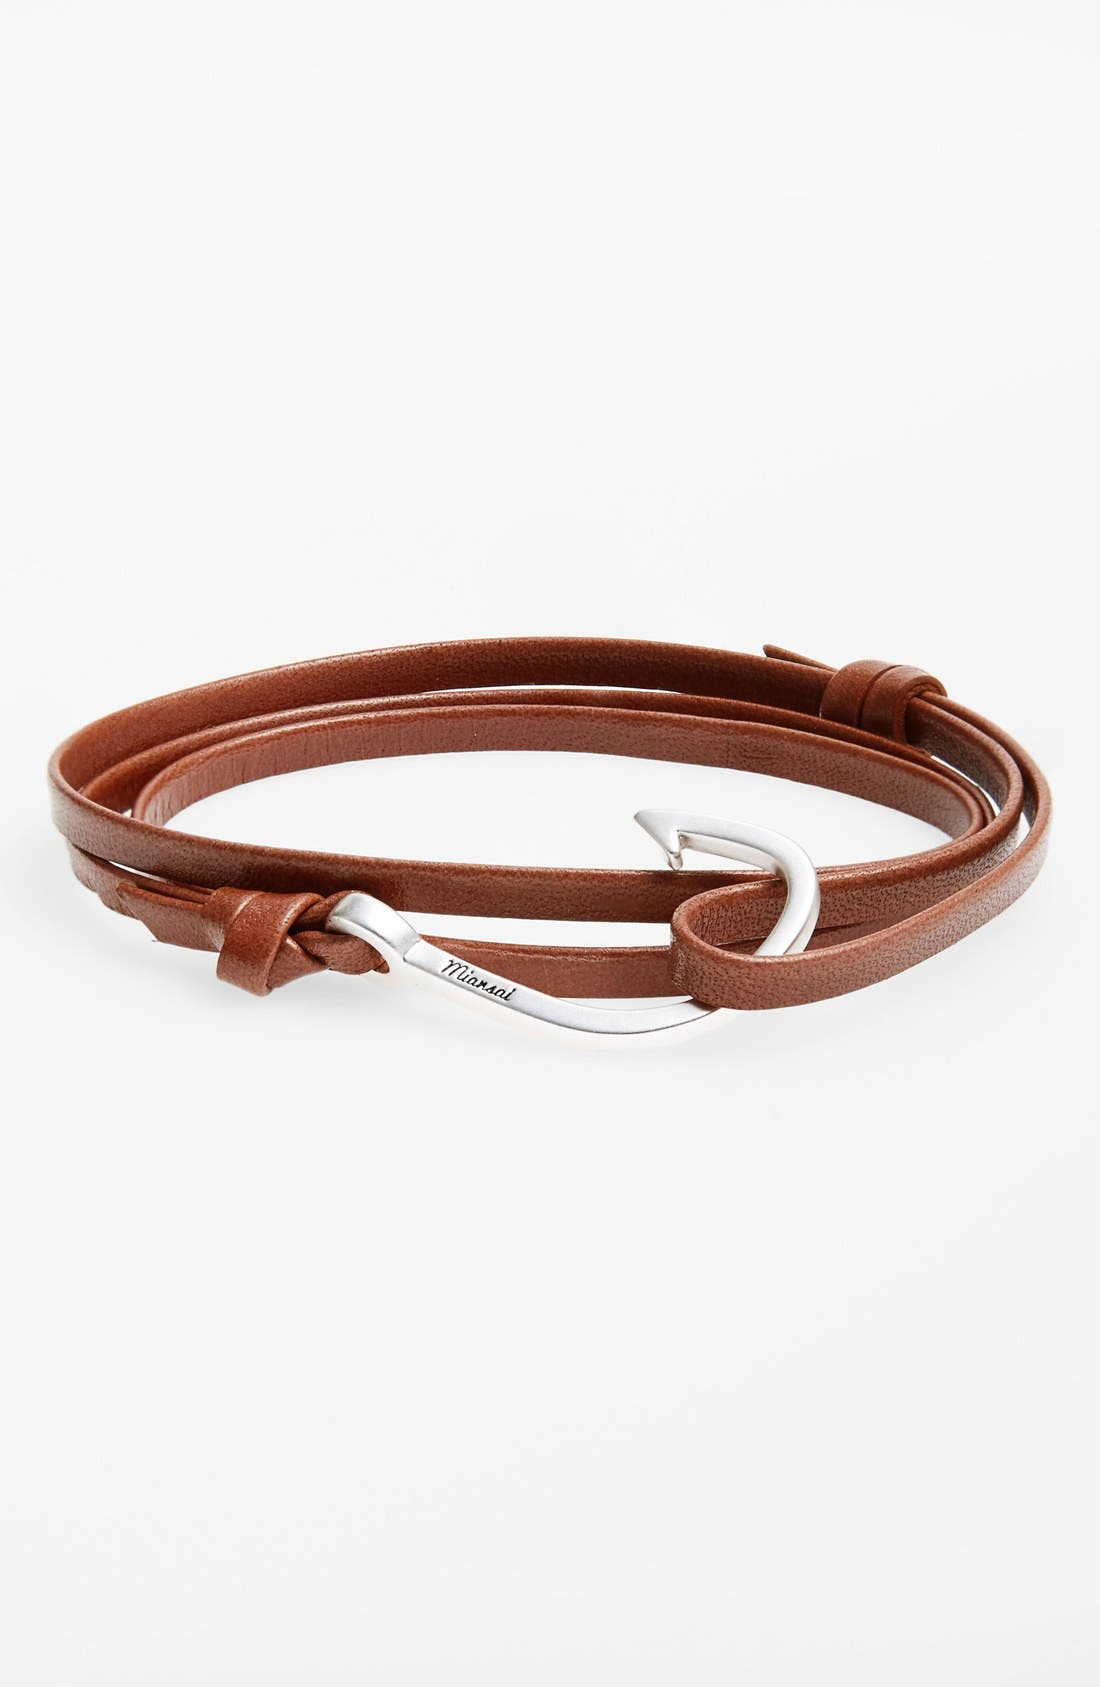 Silver Hook Leather Bracelet,                             Main thumbnail 1, color,                             Brown